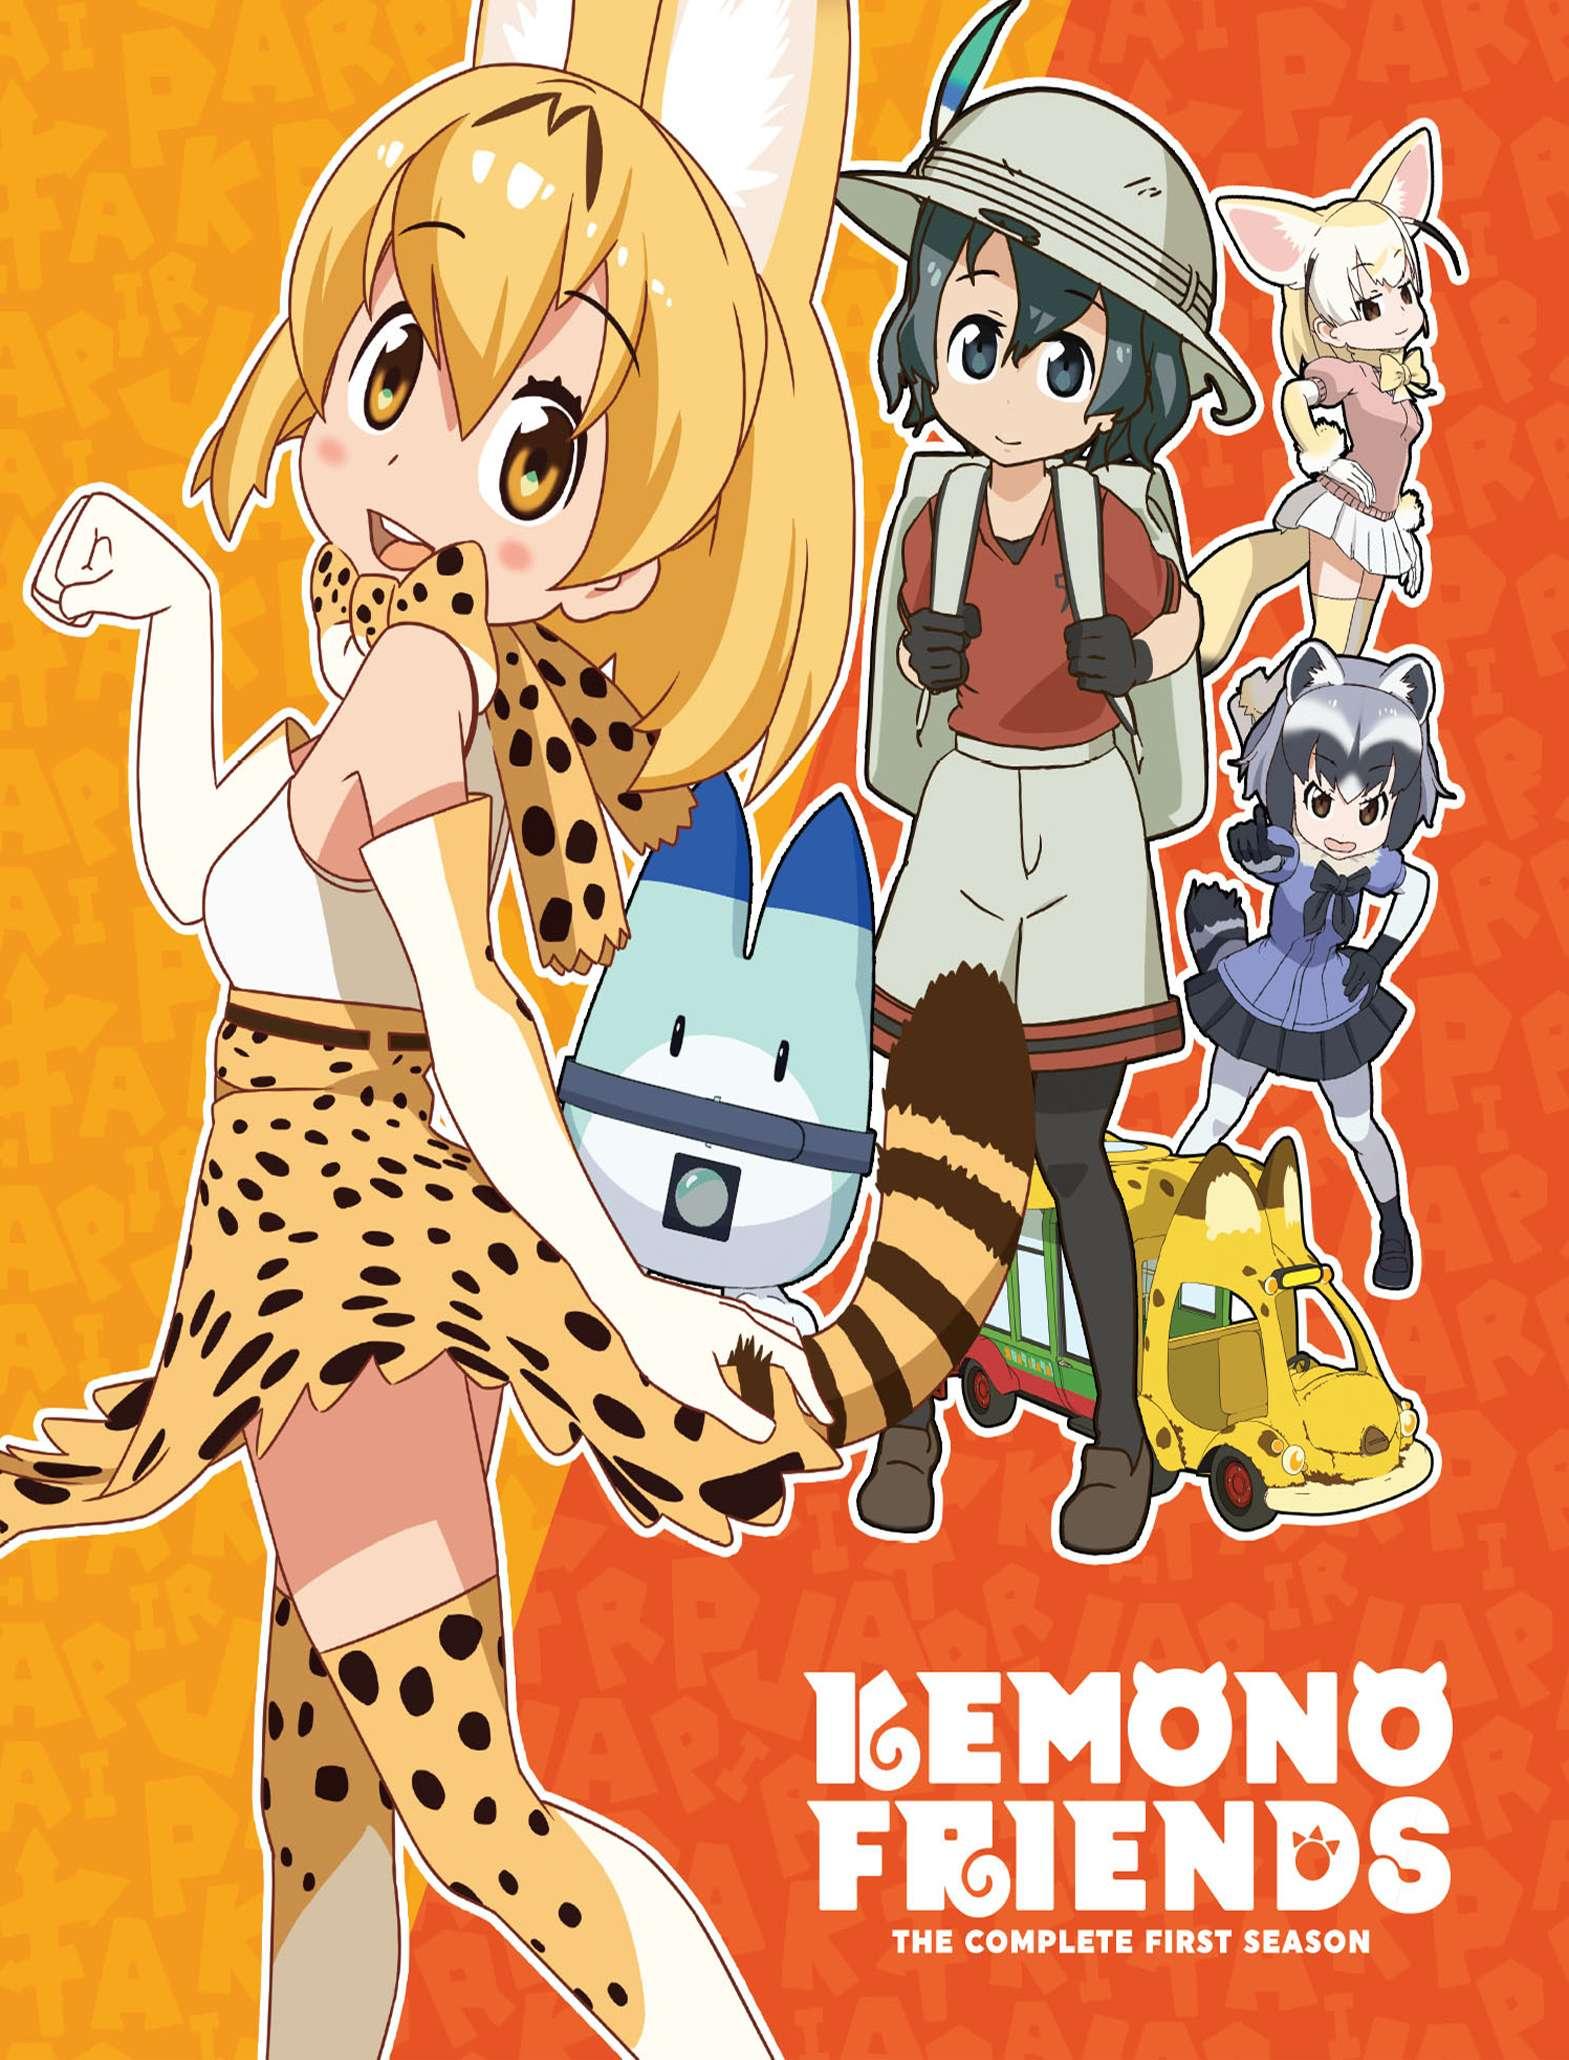 'Kemono Friends' Abruptly Fired Its Director & Fans Aren't Happy